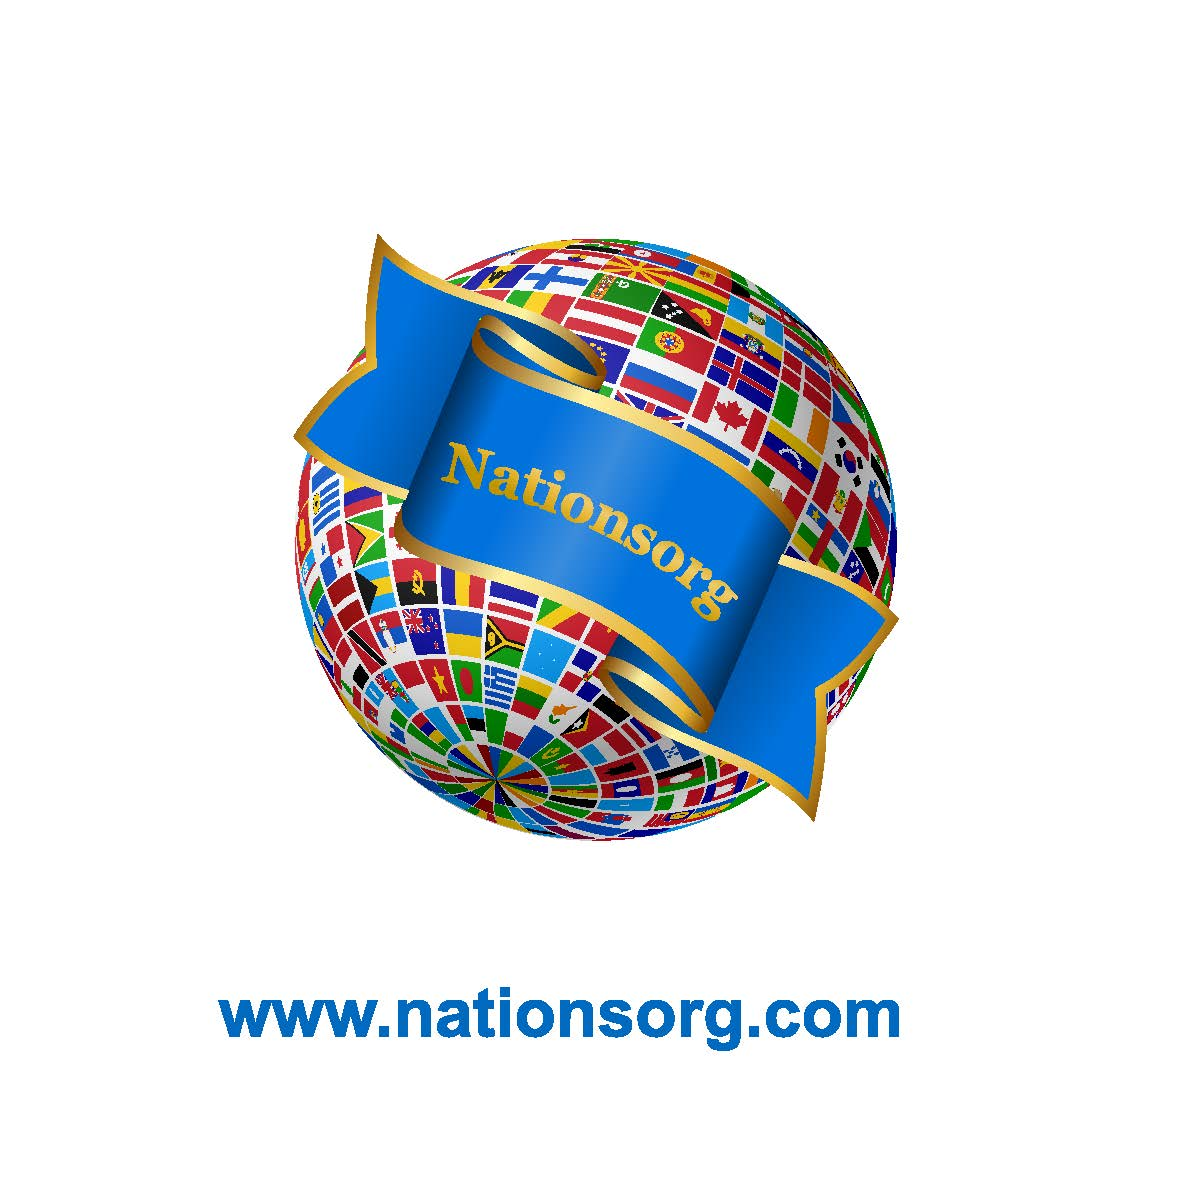 logo-HIGH-_nationsorg